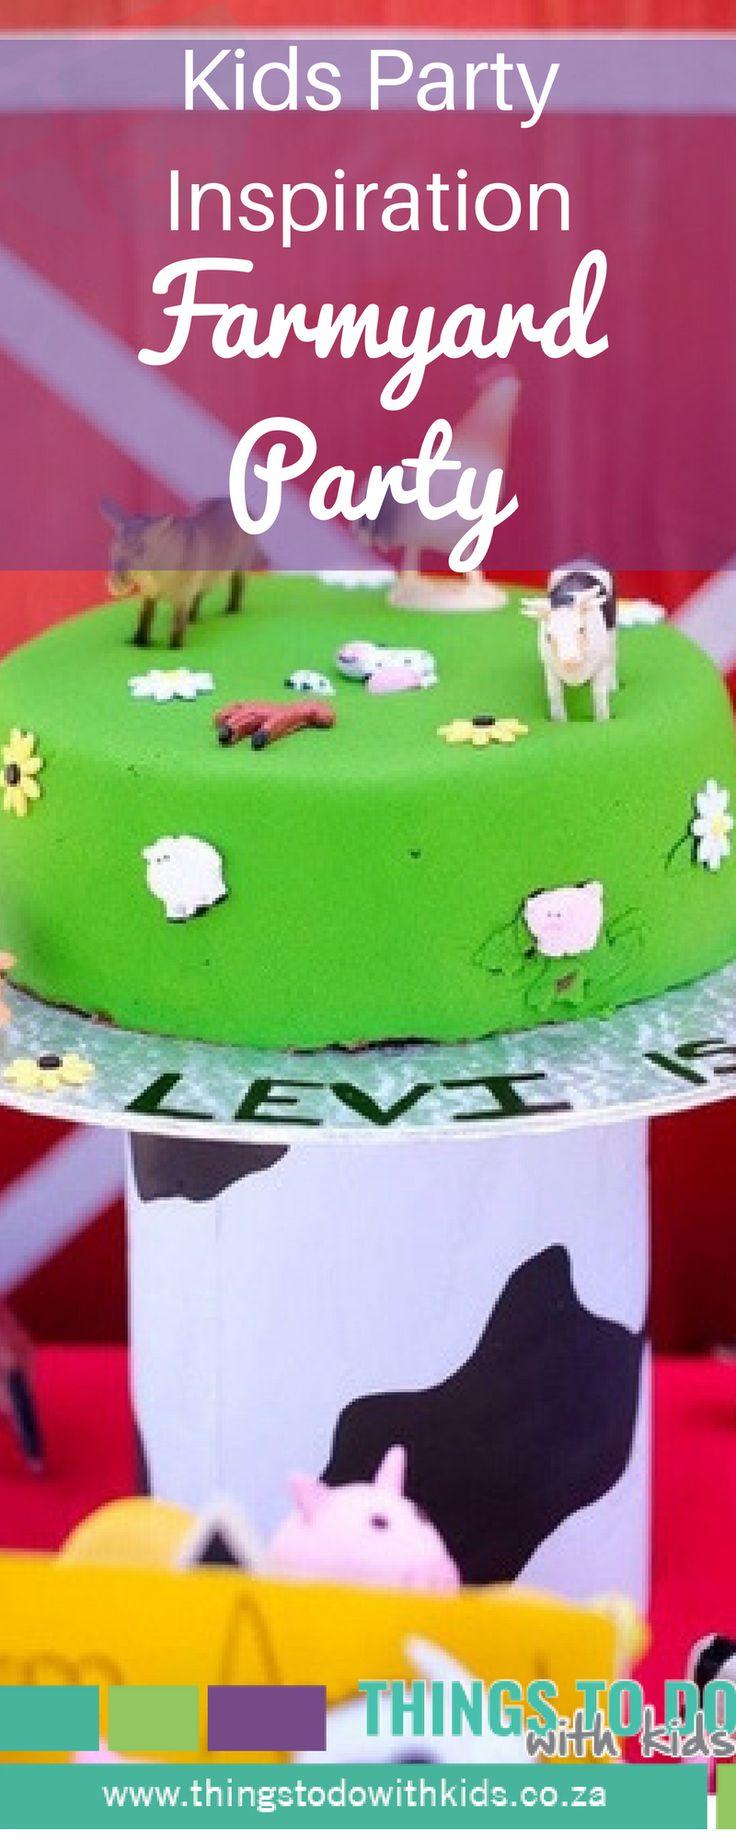 Unique Kids Party Venues Ideas On Pinterest Kids Birthday - Children's birthday parties west yorkshire